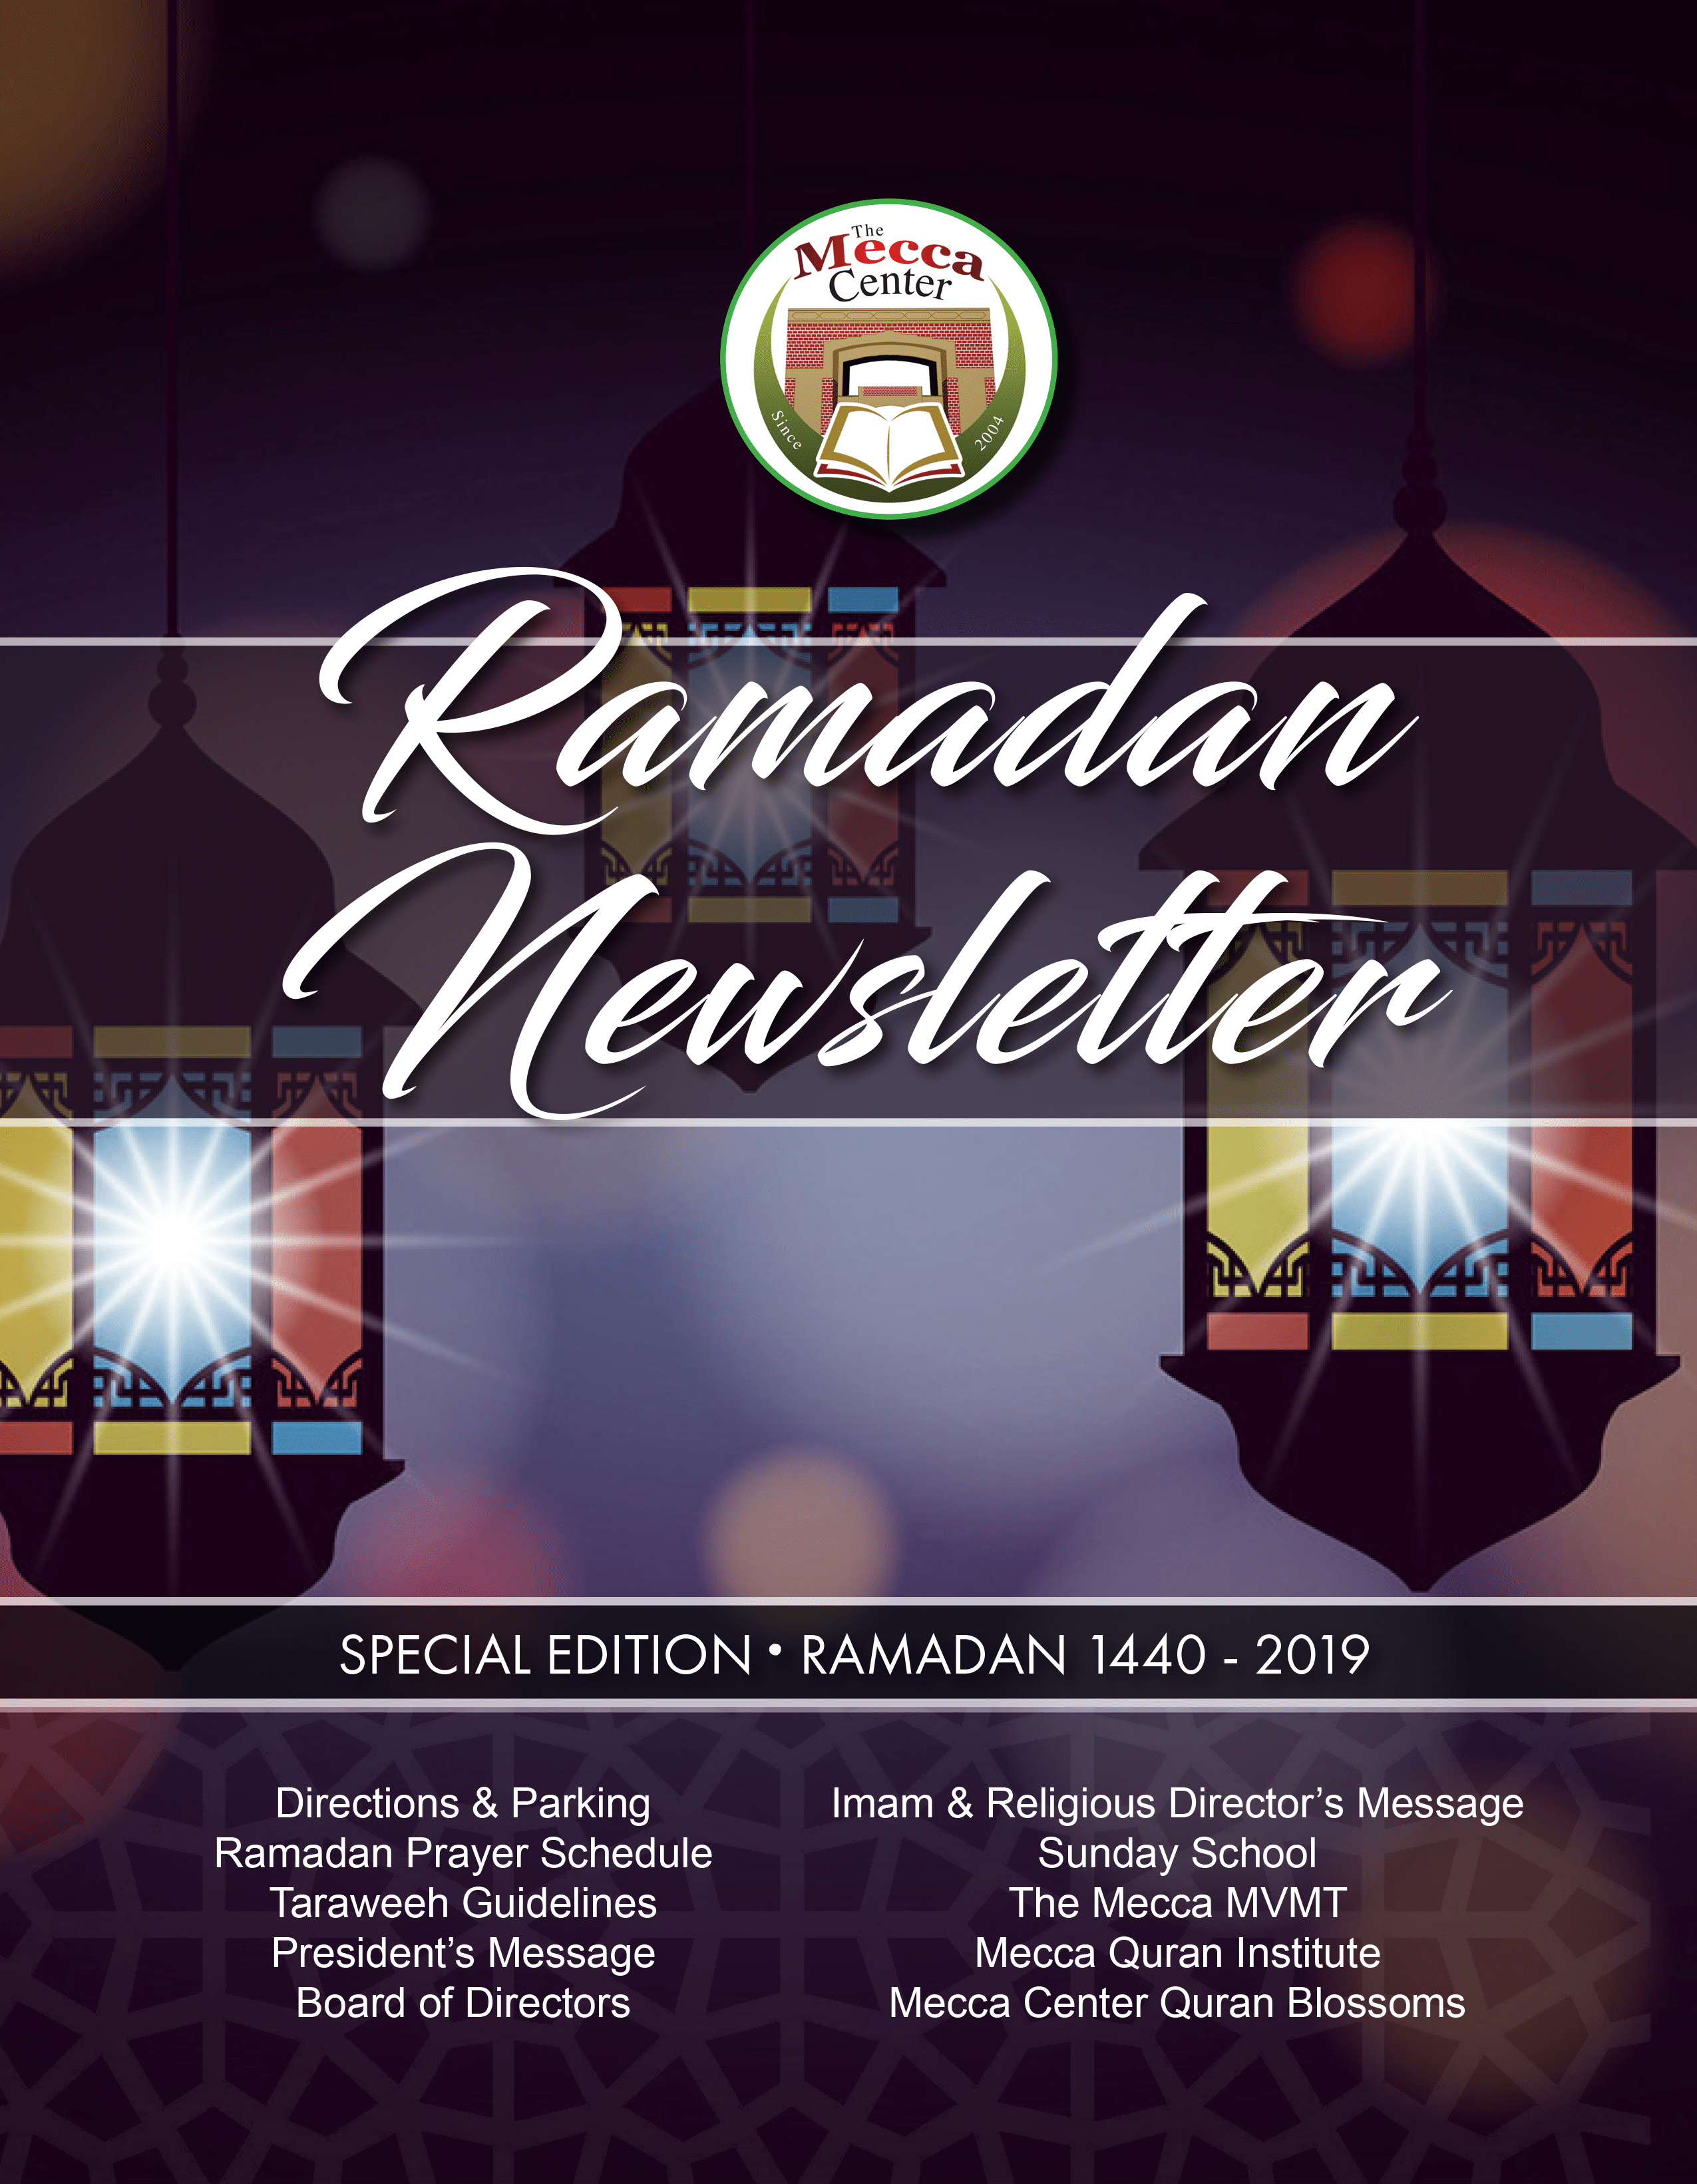 The Mecca Center: 2019 Ramadan Newsletter – Mecca Center